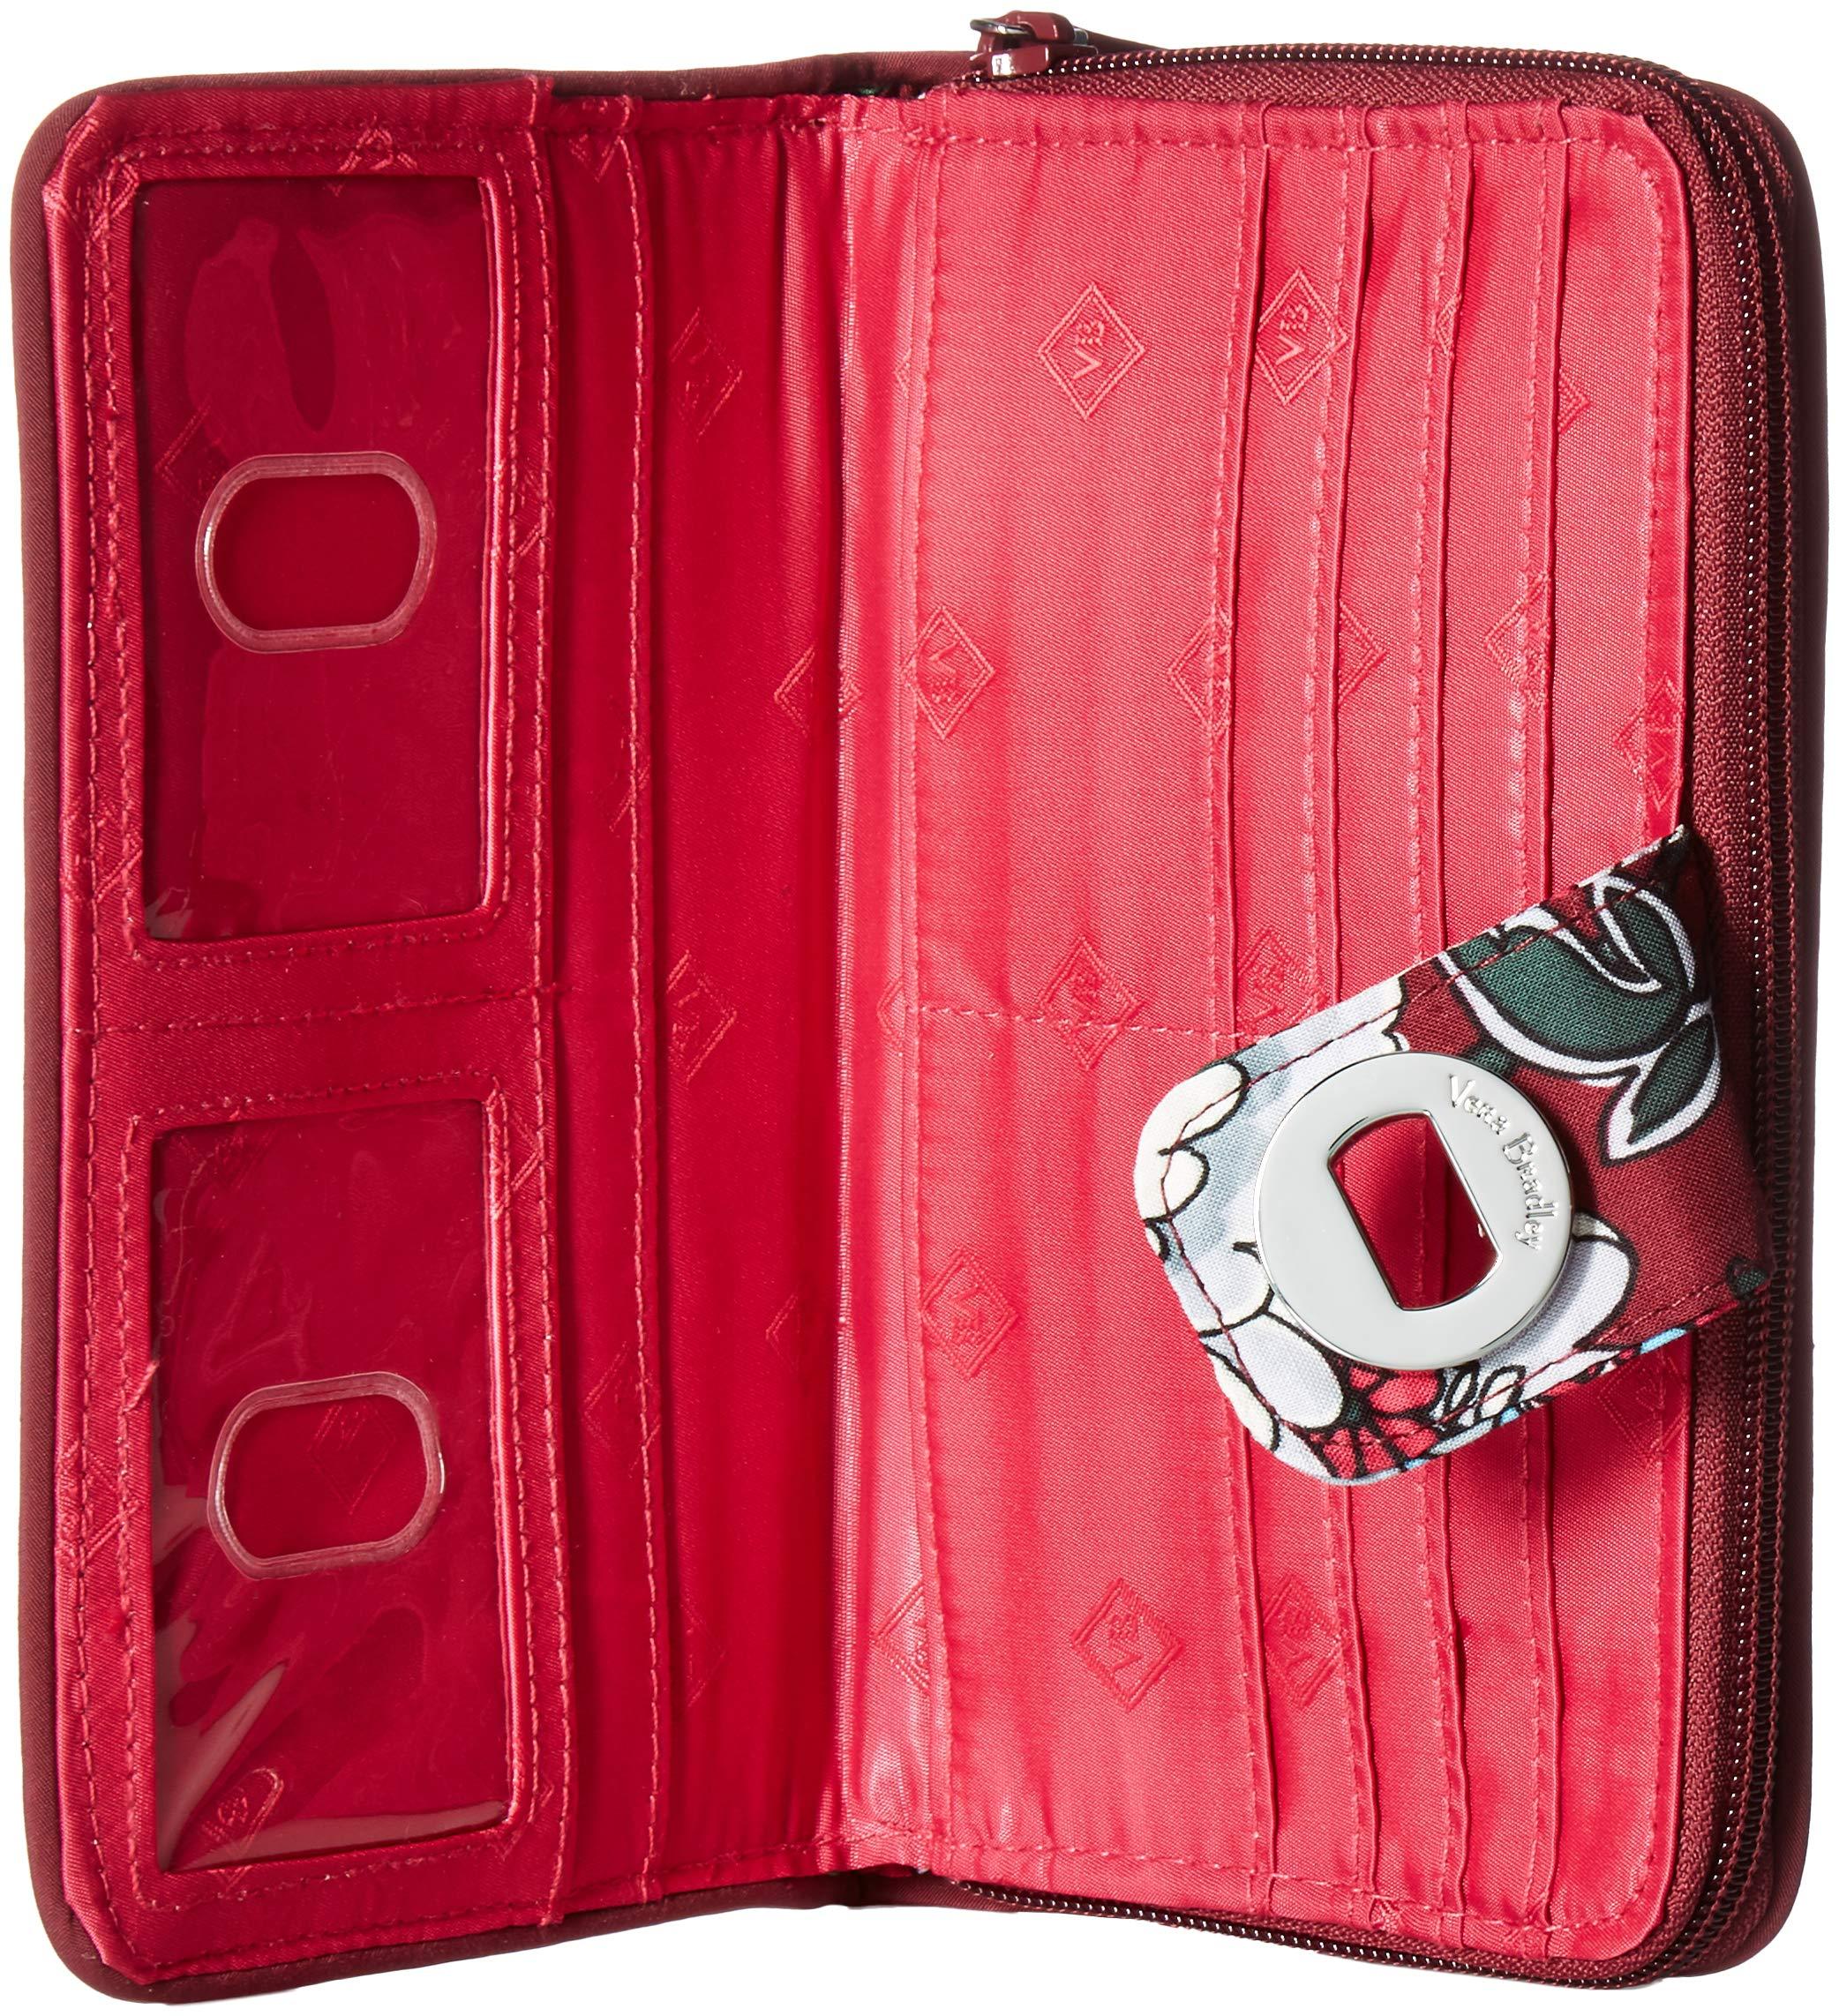 Vera Bradley RFID Turnlock Wallet,  Signature Cotton, One Size by Vera Bradley (Image #5)